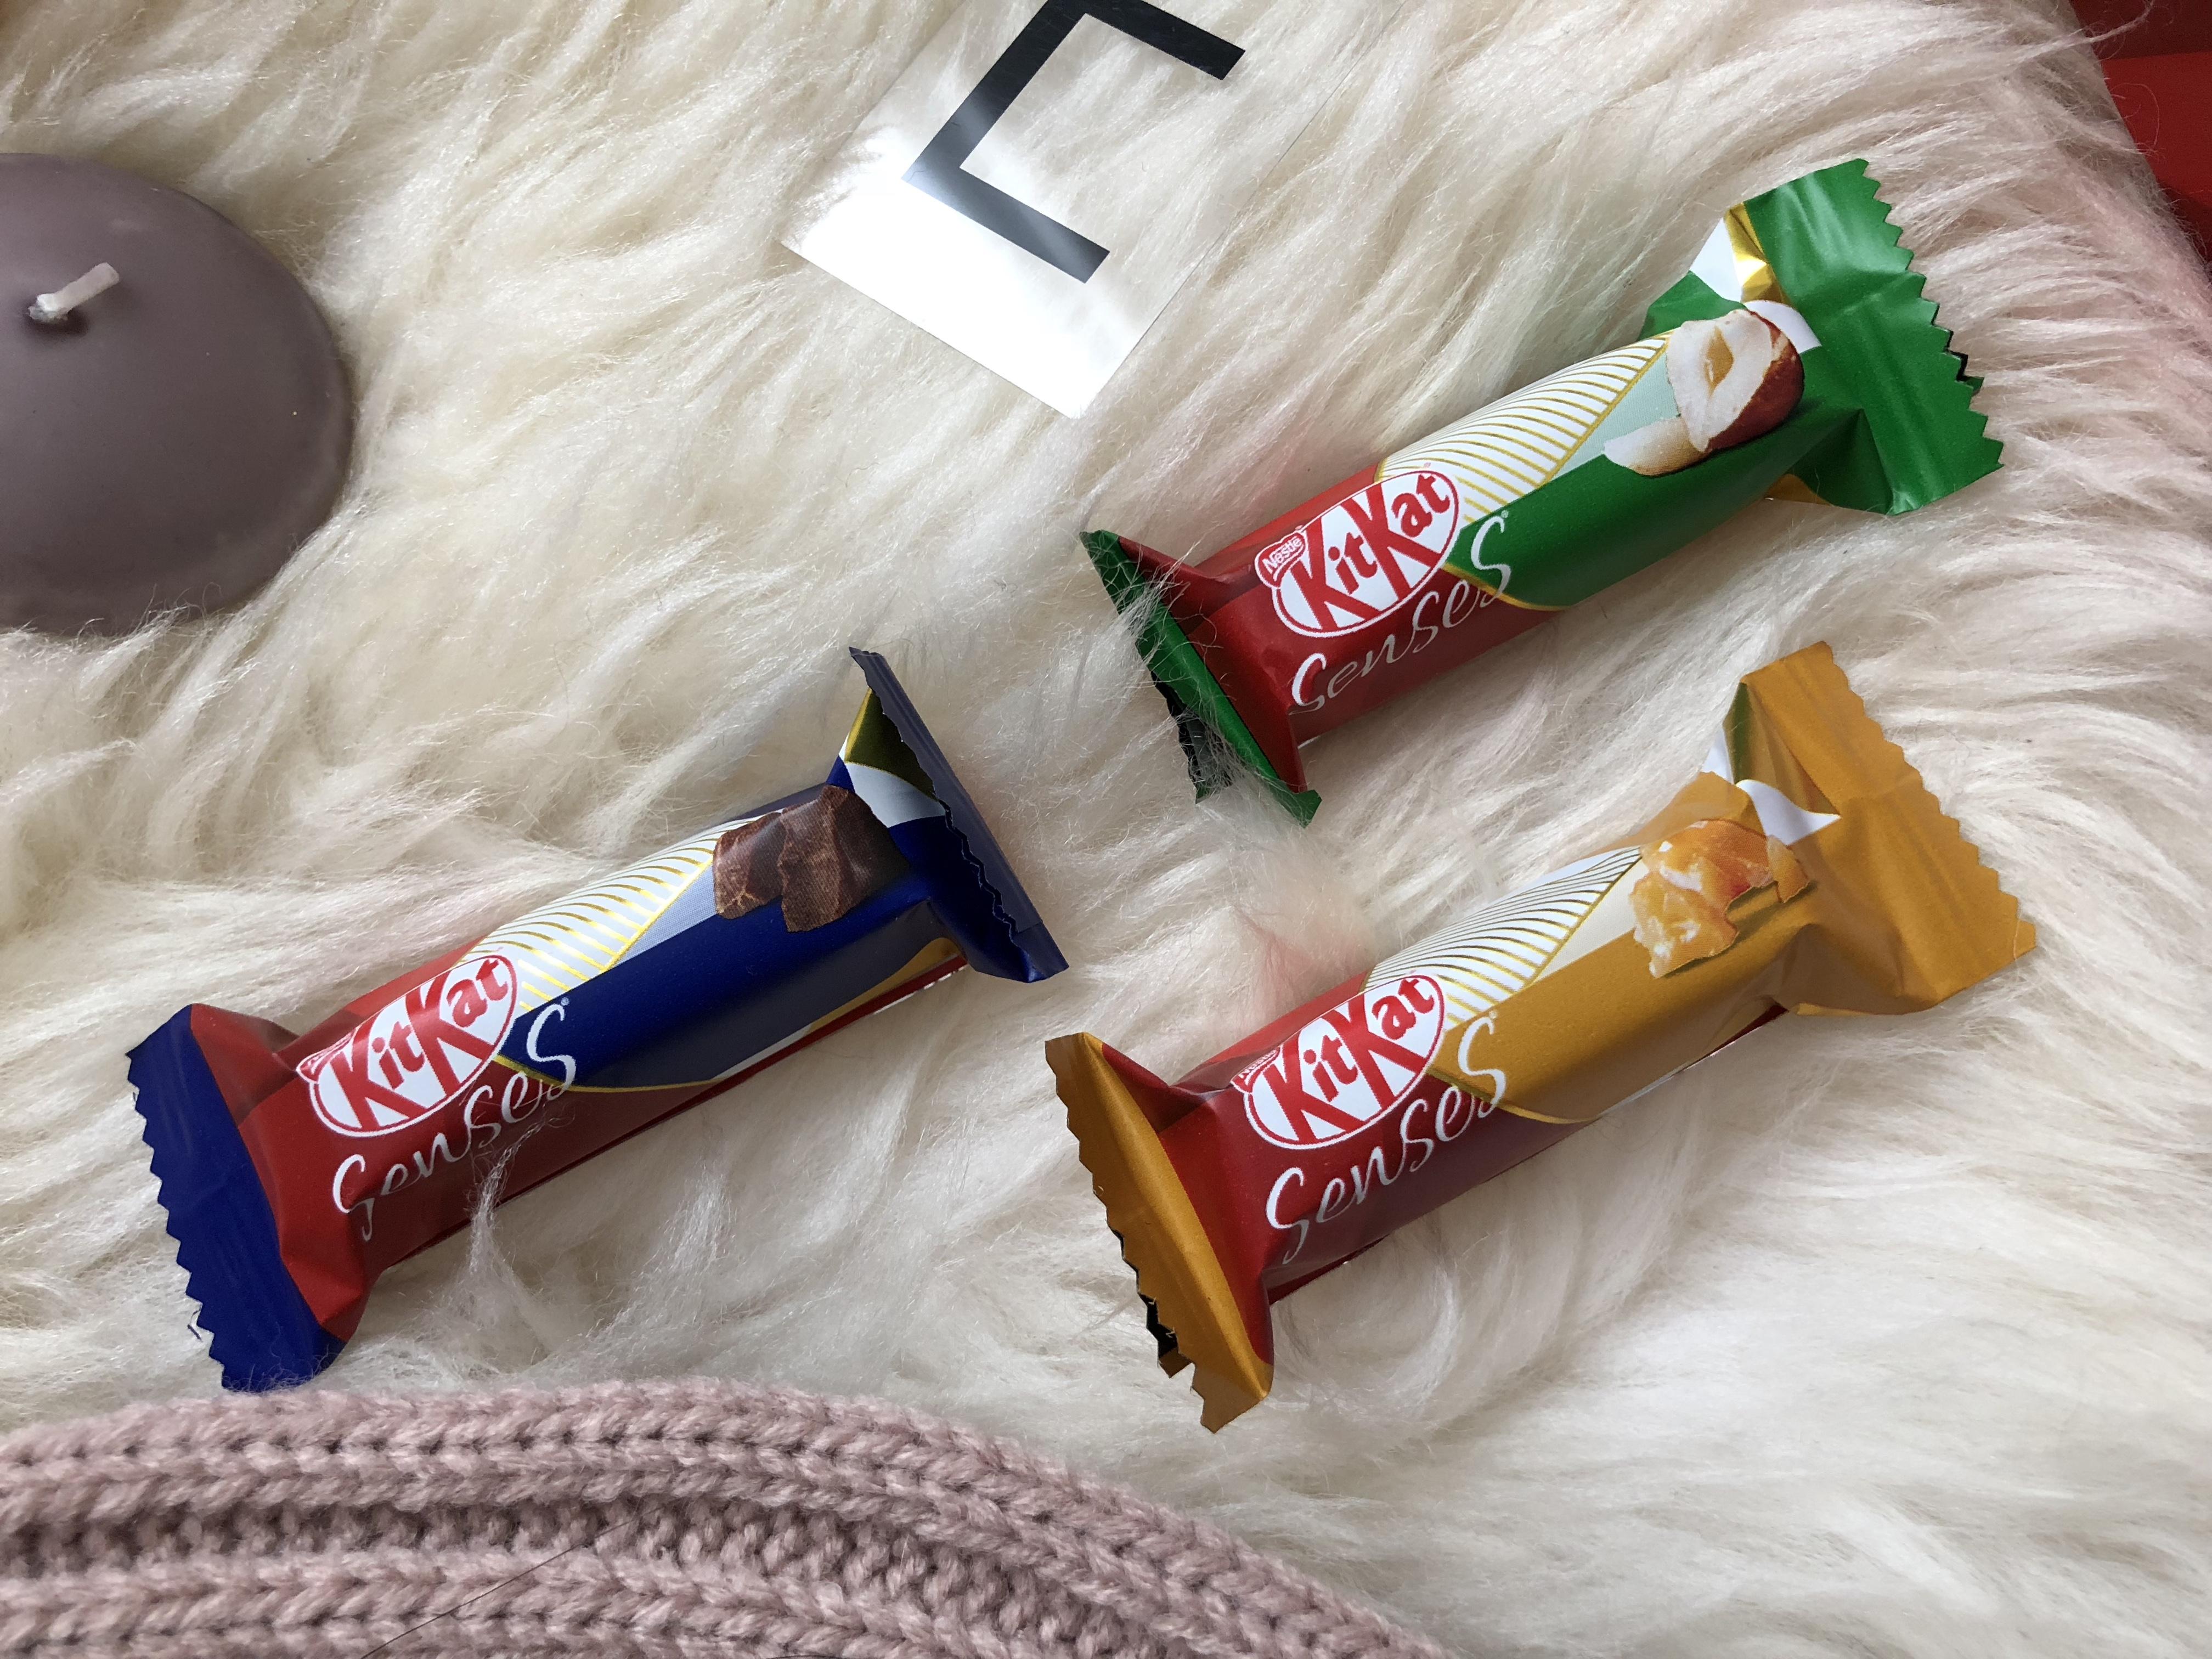 Kitkat senses